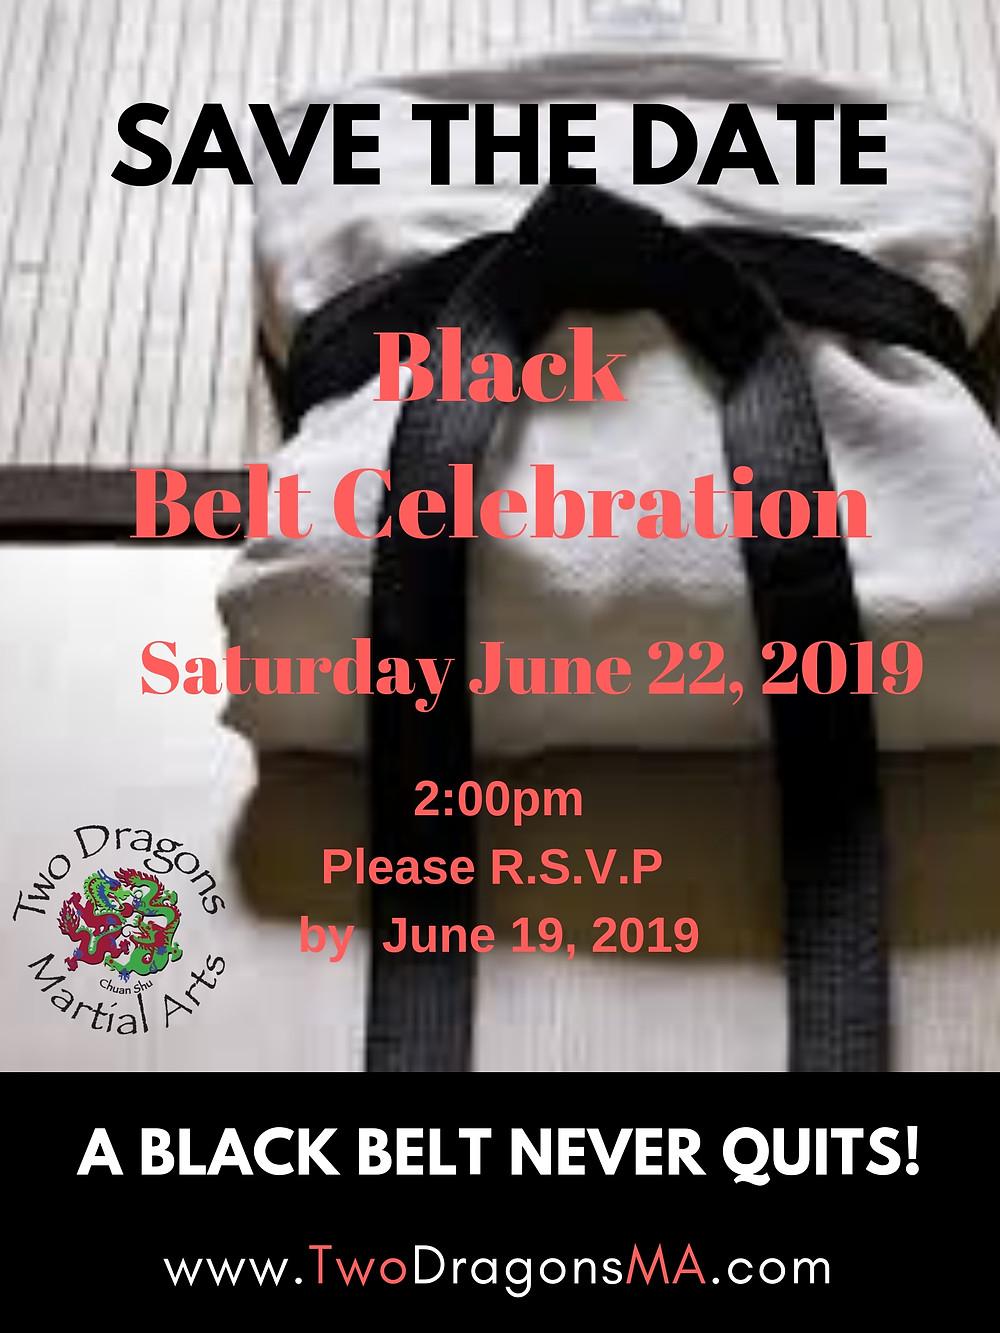 Saturday June 22, 2019